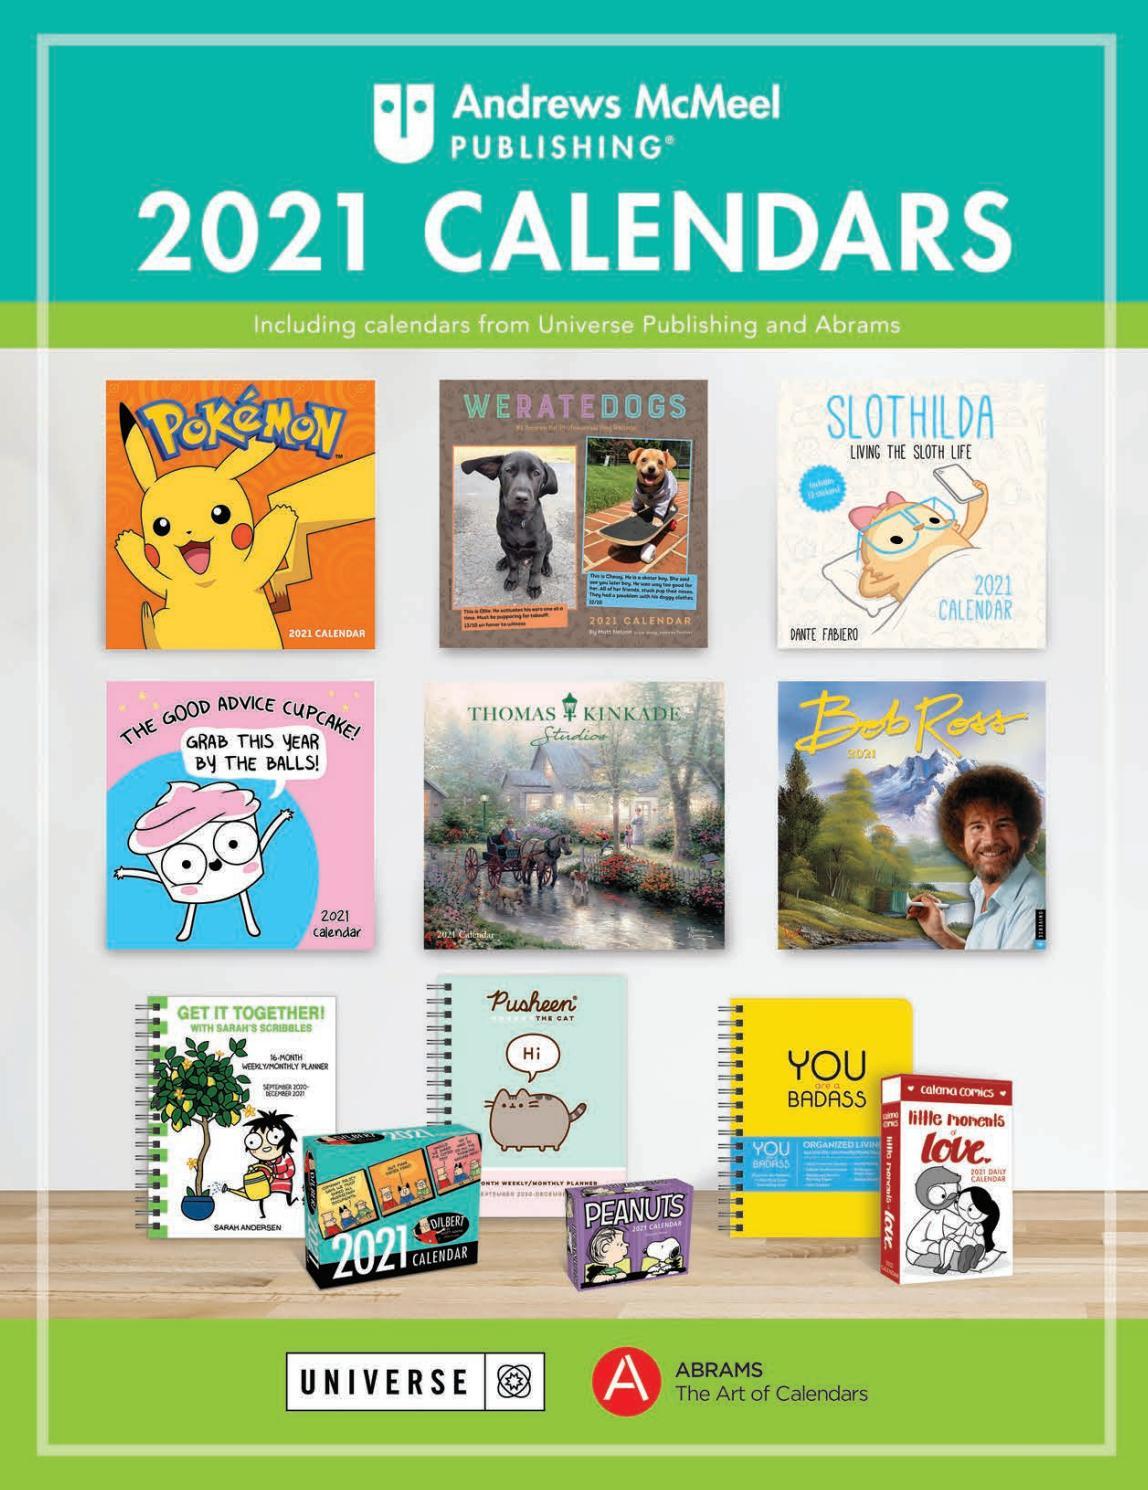 Andrews Mcmeel 2021 Calendar Catalogandrews Mcmeel With Regard To American River College 2021 Calendar